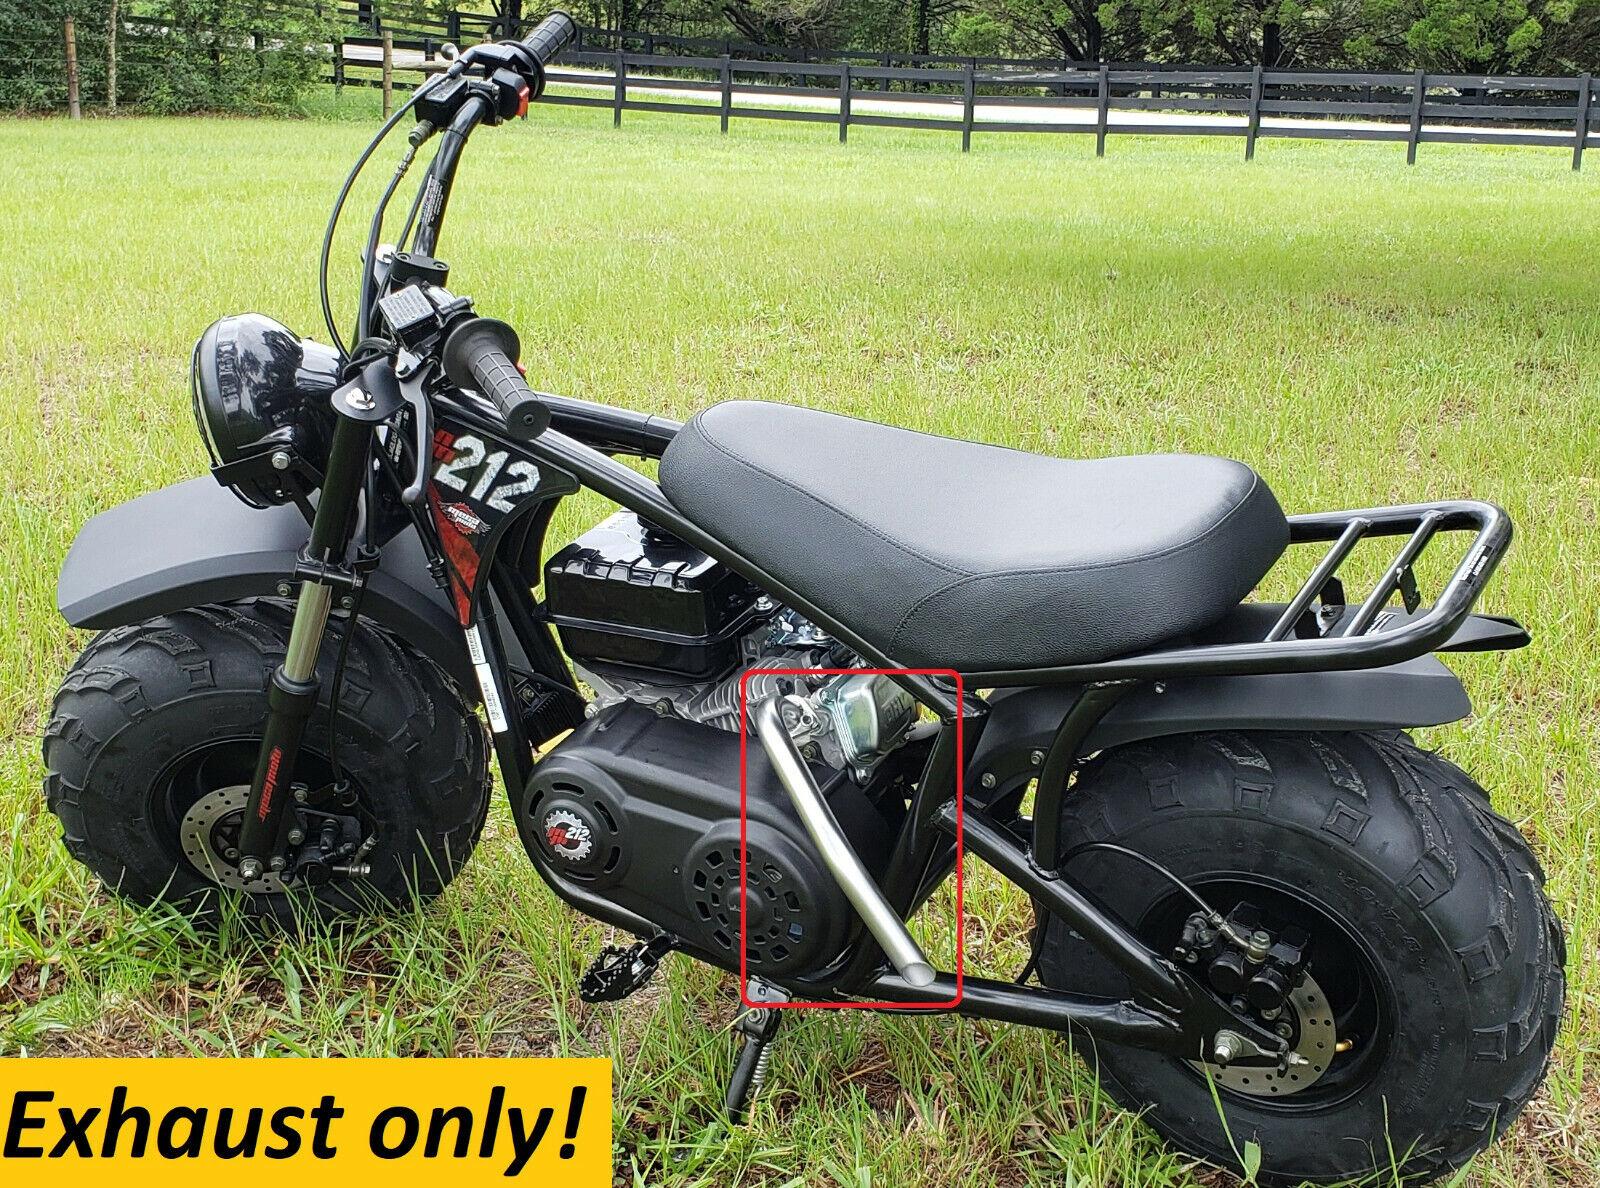 Exhaust Header for: Mega Moto 212cc Gas Powered Mini Bike Pr